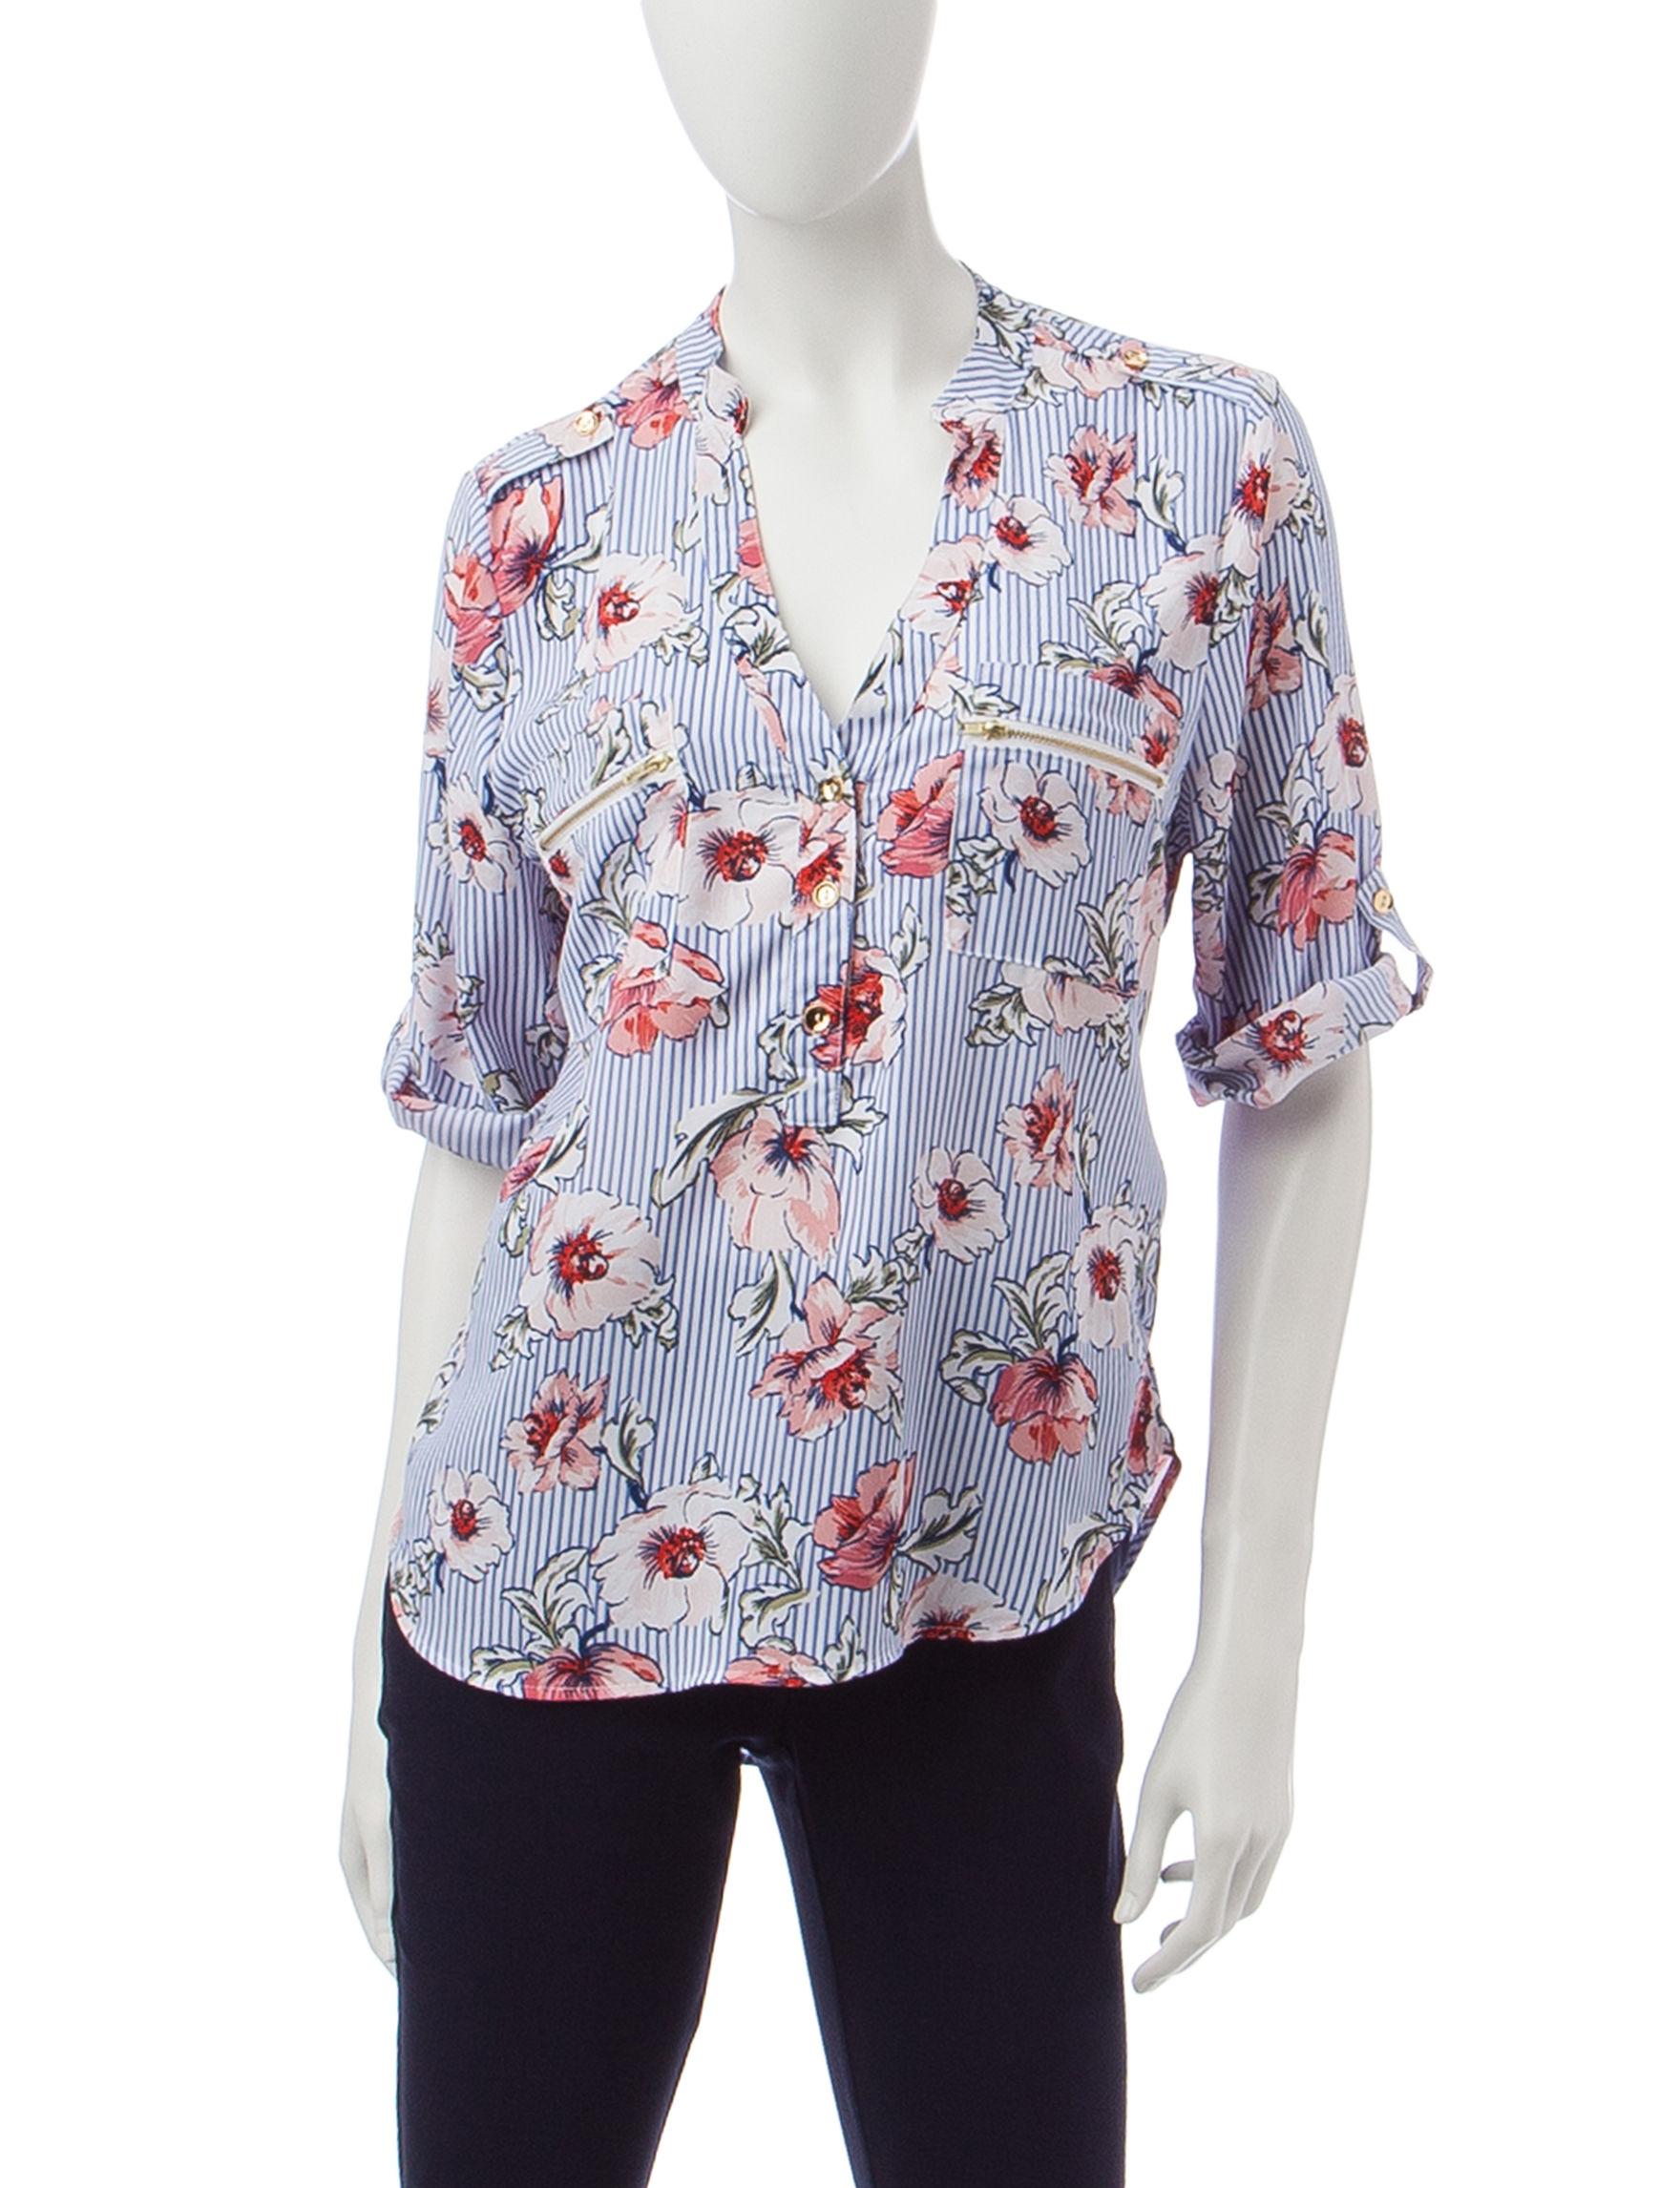 Wishful Park Stripe / Floral Shirts & Blouses